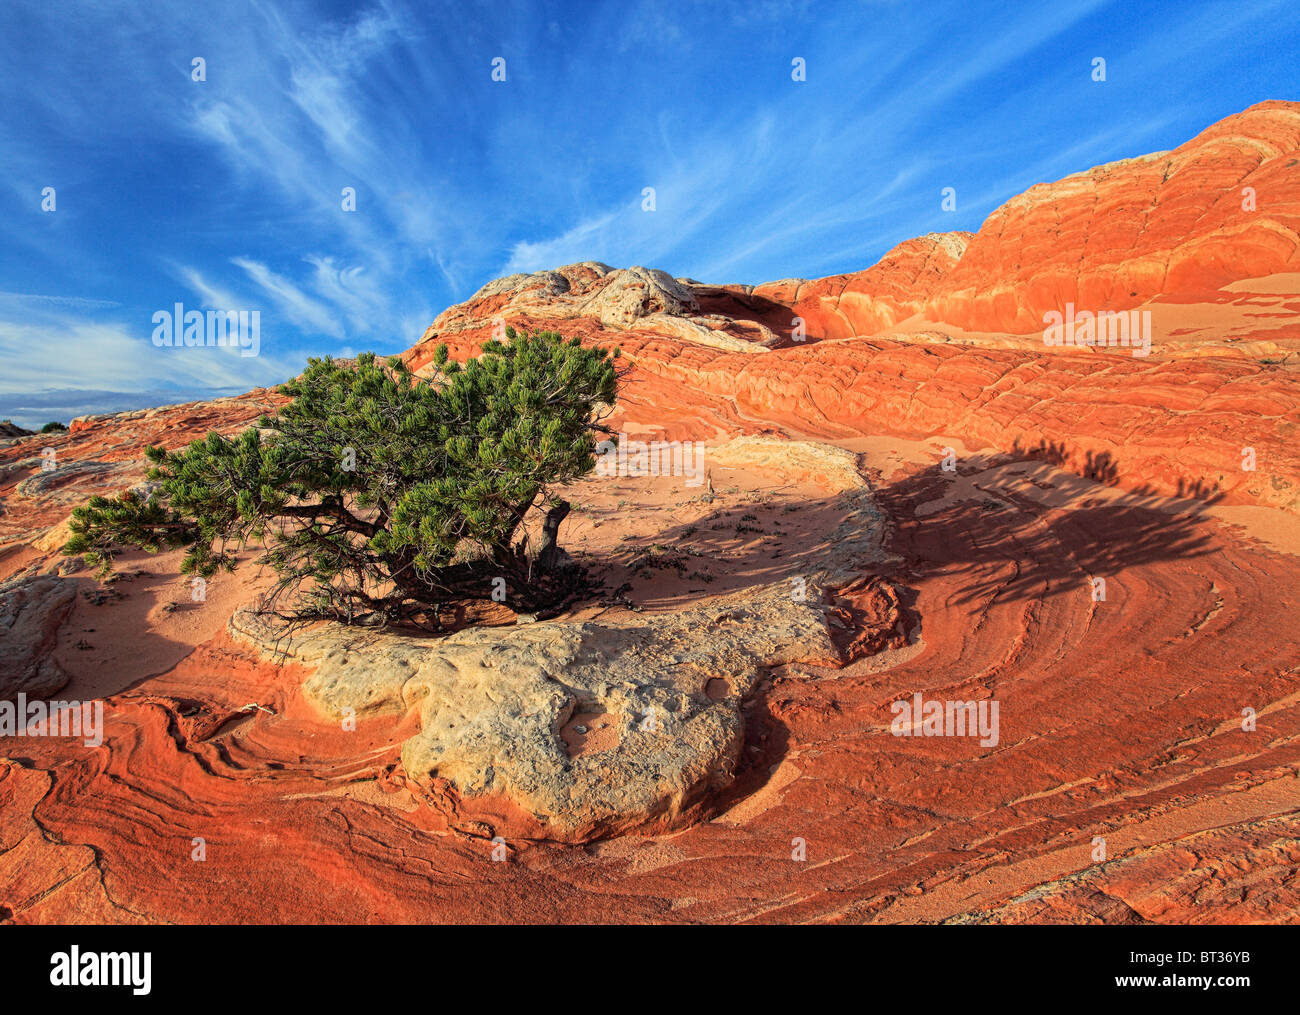 White Pocket in the Vermilion Cliffs National Monument, Arizona - Stock Image